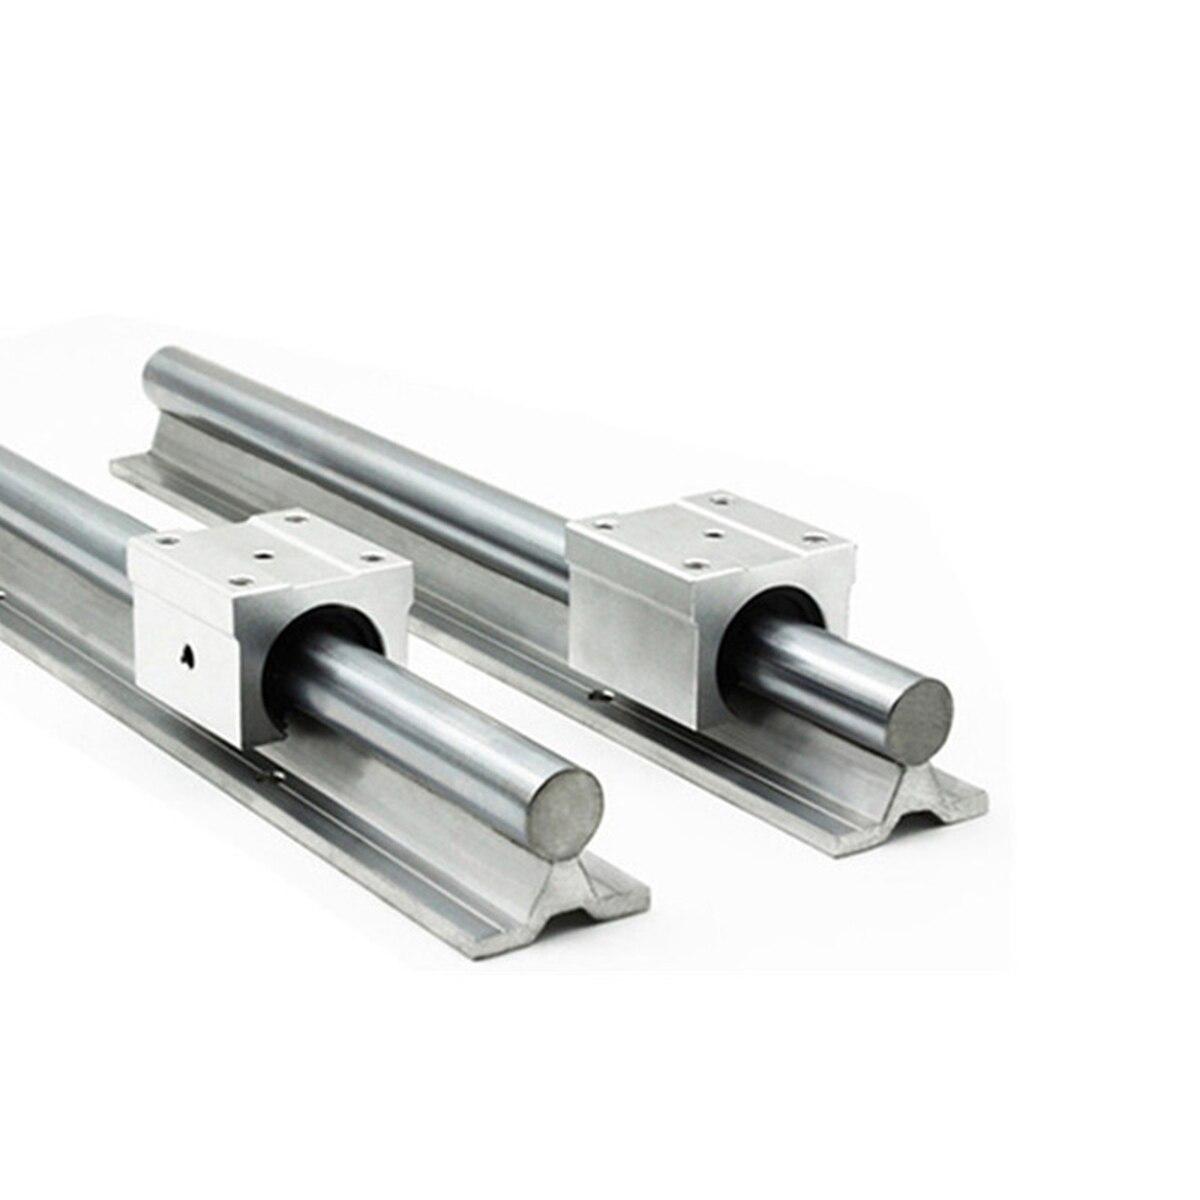 2Pcs SBR16 Linear Rail Guide 300 400 500 600 1000 1200 1500mm + 4pcs SBR16UU Linear Bearing Block Linear Rail Set